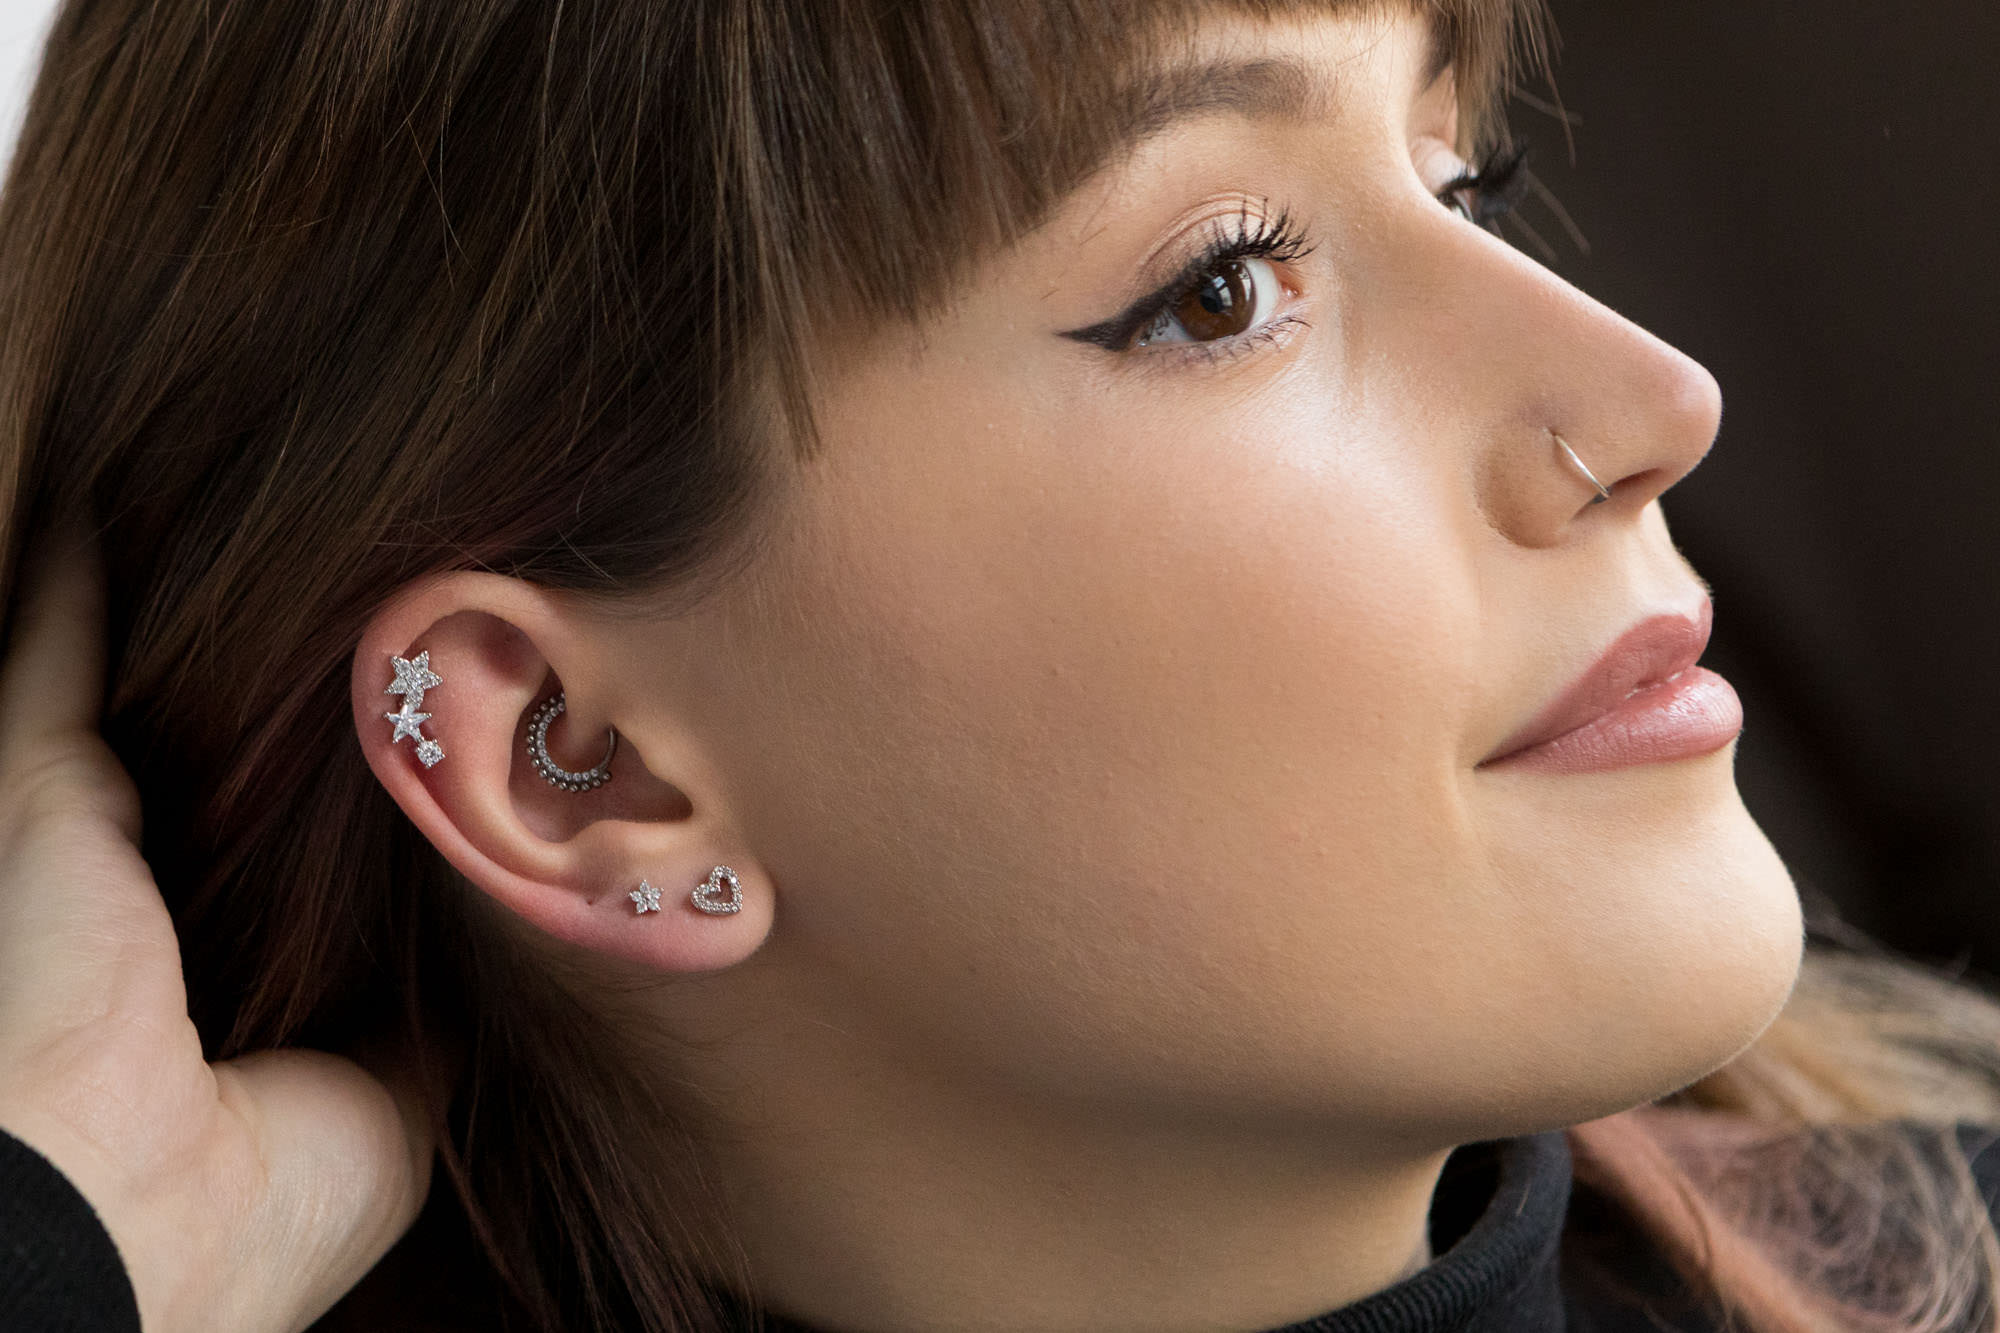 barbell design, birdesmaid jewellery, bridal accessories, bridal earrings, bridal jewellery, bridesmaid gifts, contempary jewellery, ear cuffs, helix, huggie hoops, labreyt design, lip rings, lobe earrings, modern jewellery, nose rings, stackable earrings, stacked earrings, statement jewellery, tragus, twilight london